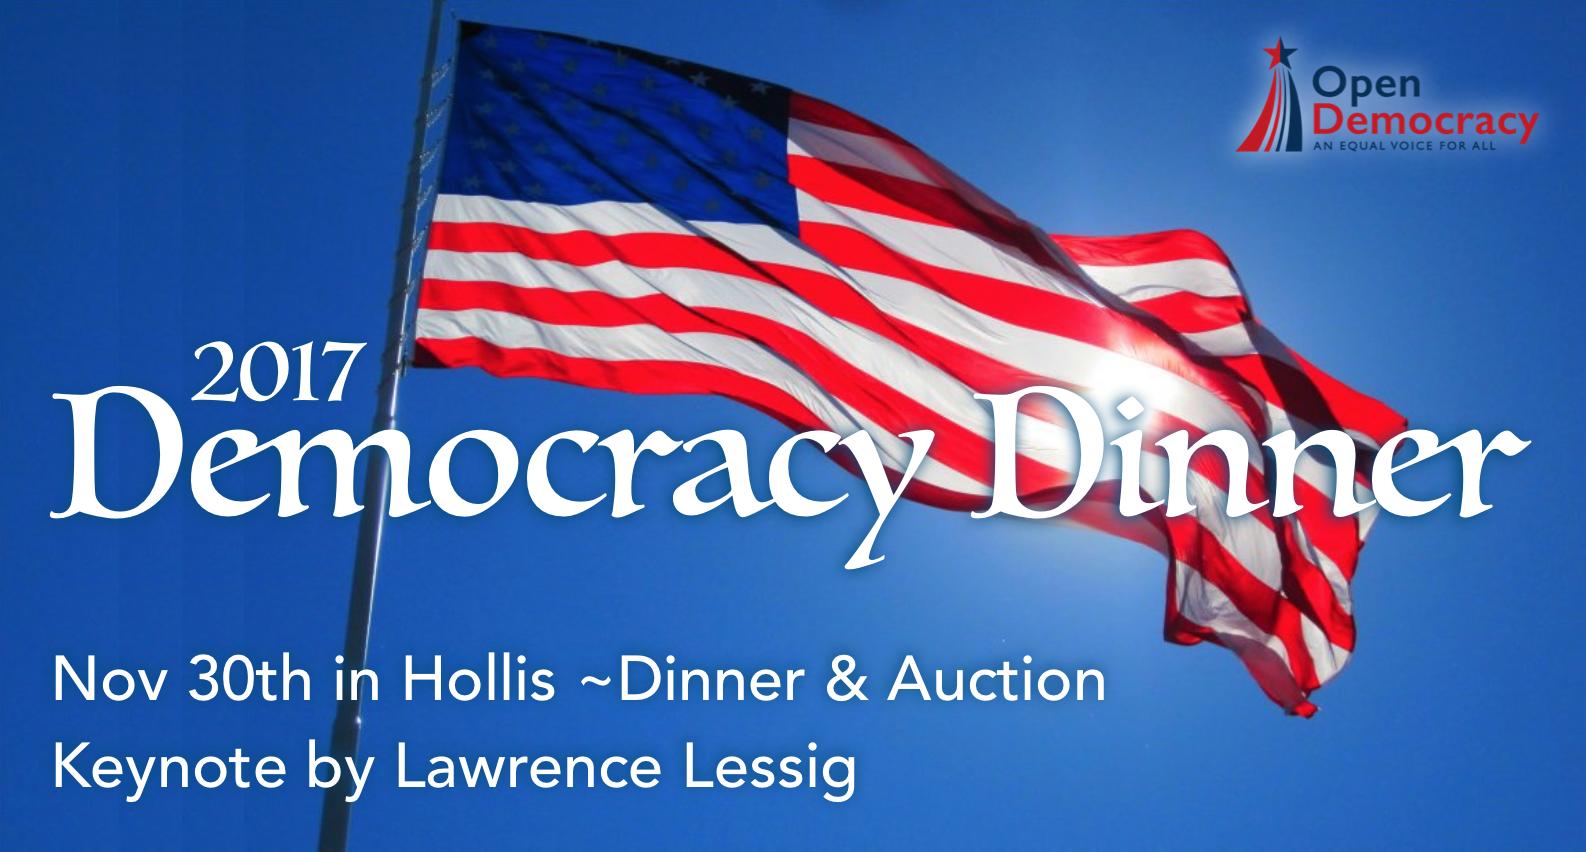 DemocracyDinner2.png